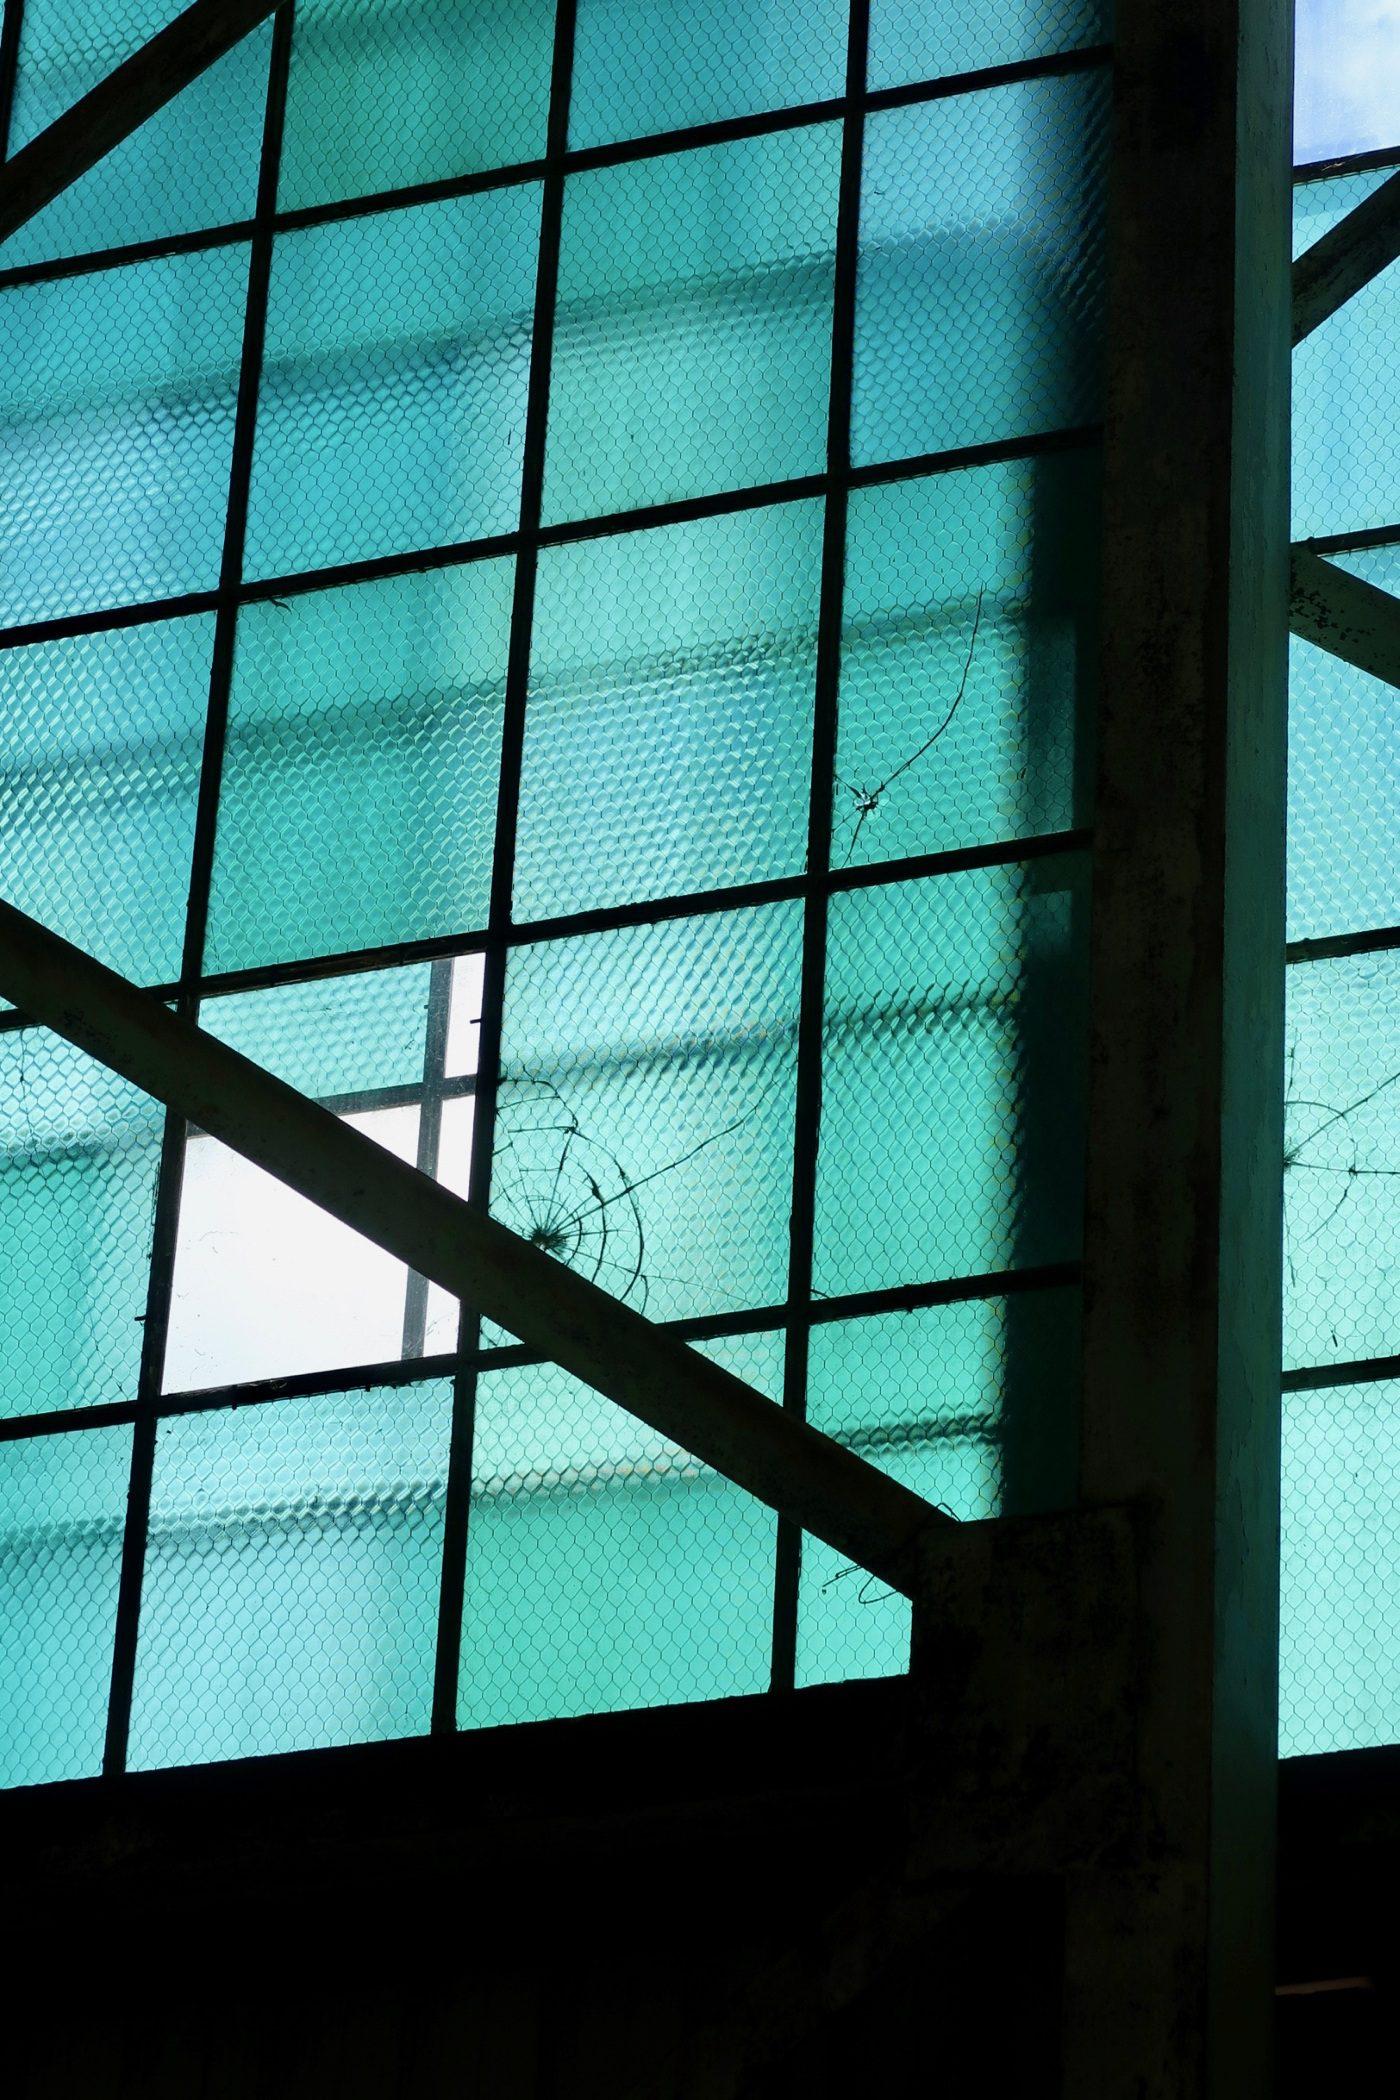 A broken window in a Pearl Harbor hanger.